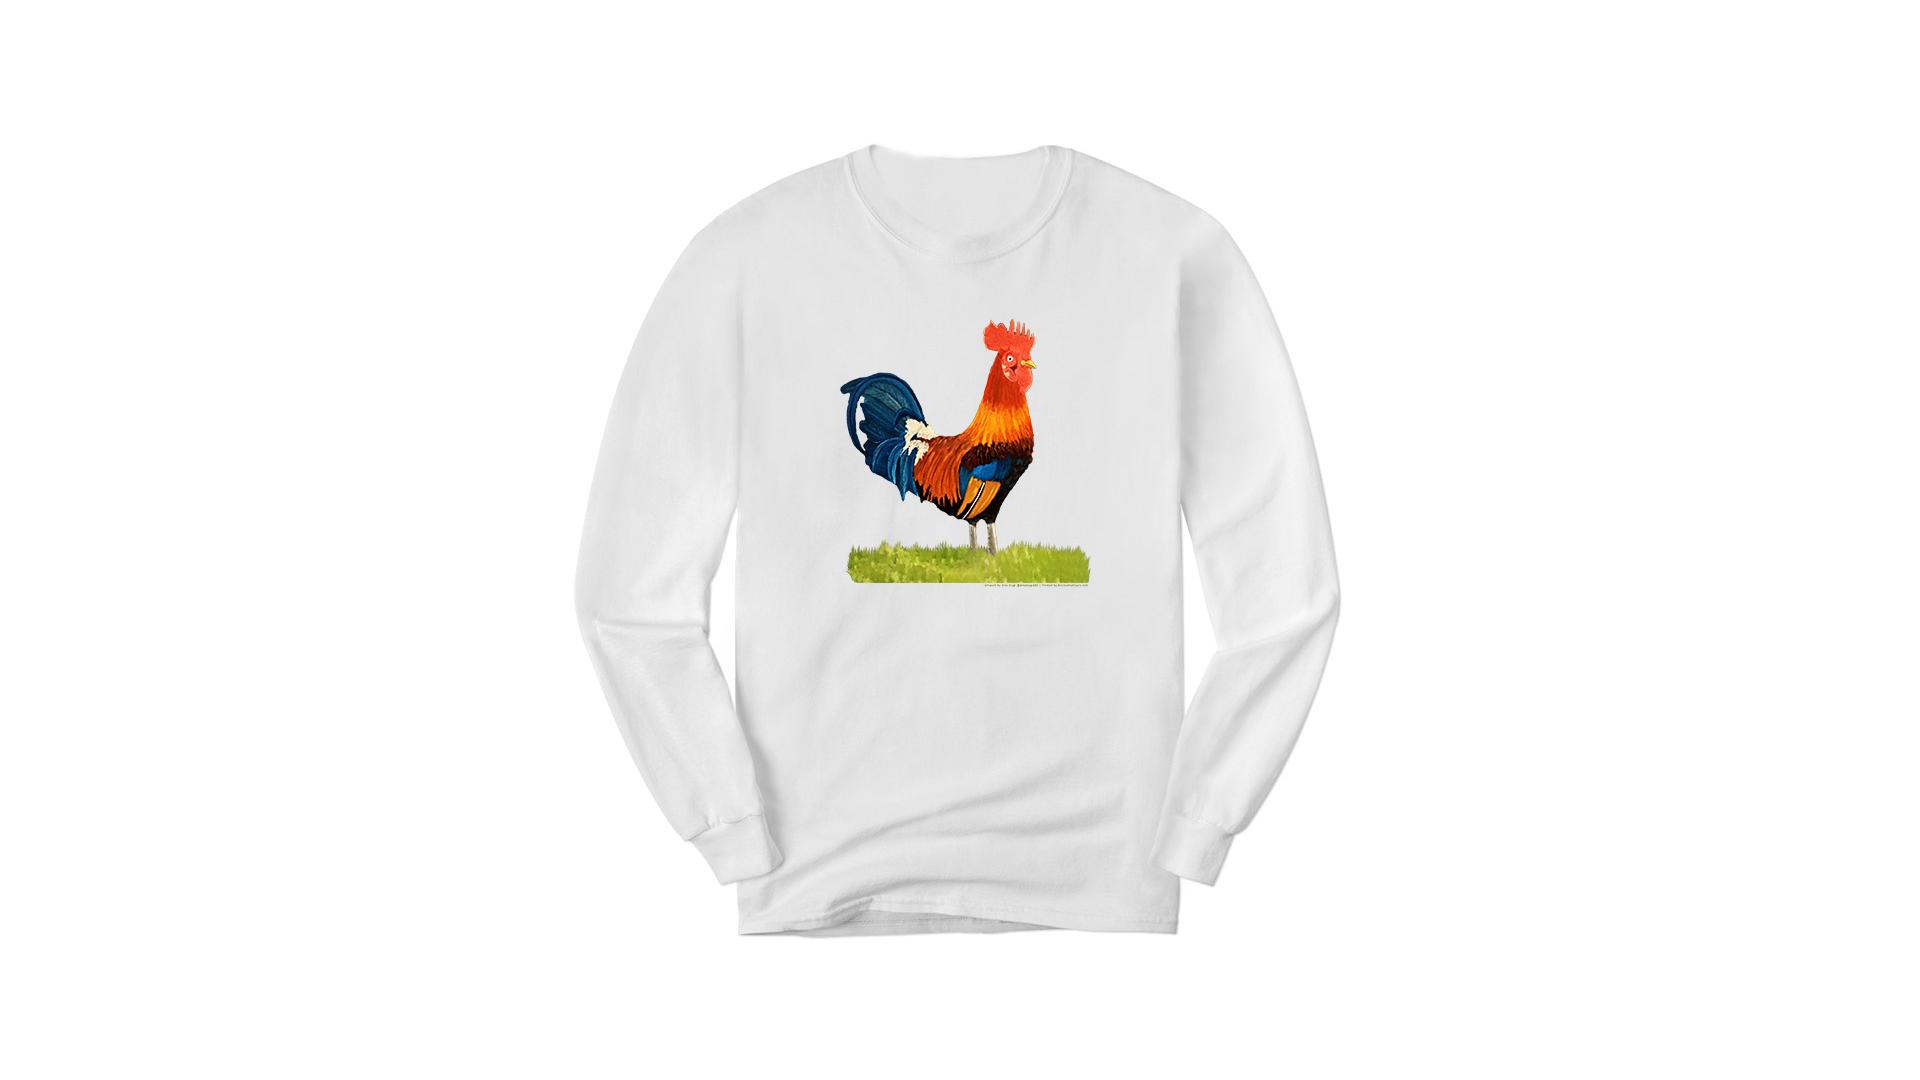 White Long Sleeve Rooster og.png